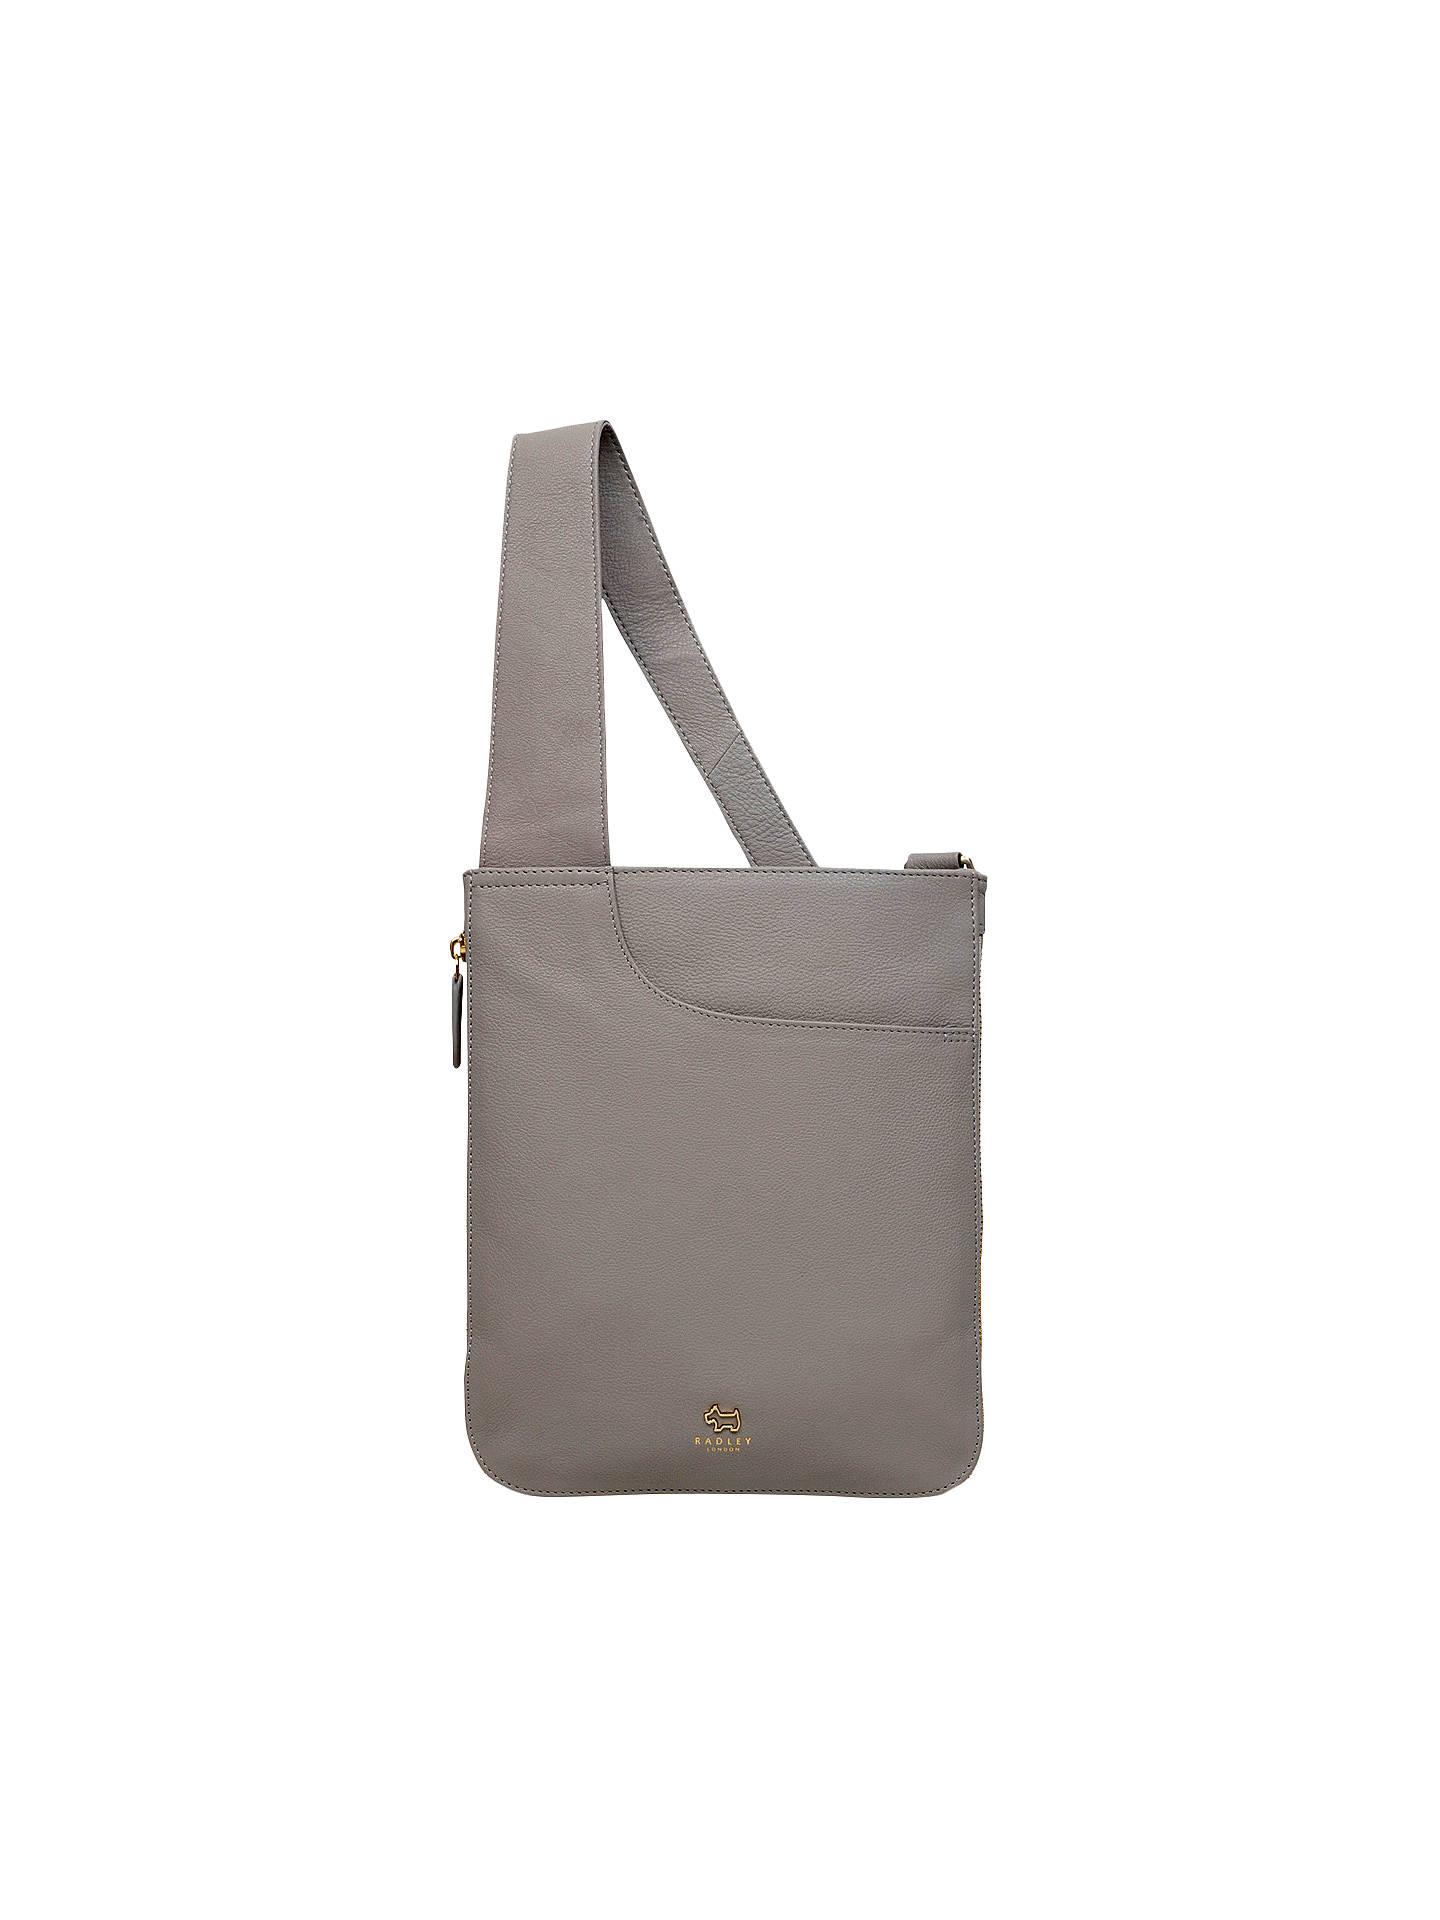 Buy Radley Pocket Bag Leather Medium Cross Body Bag 238521953d874